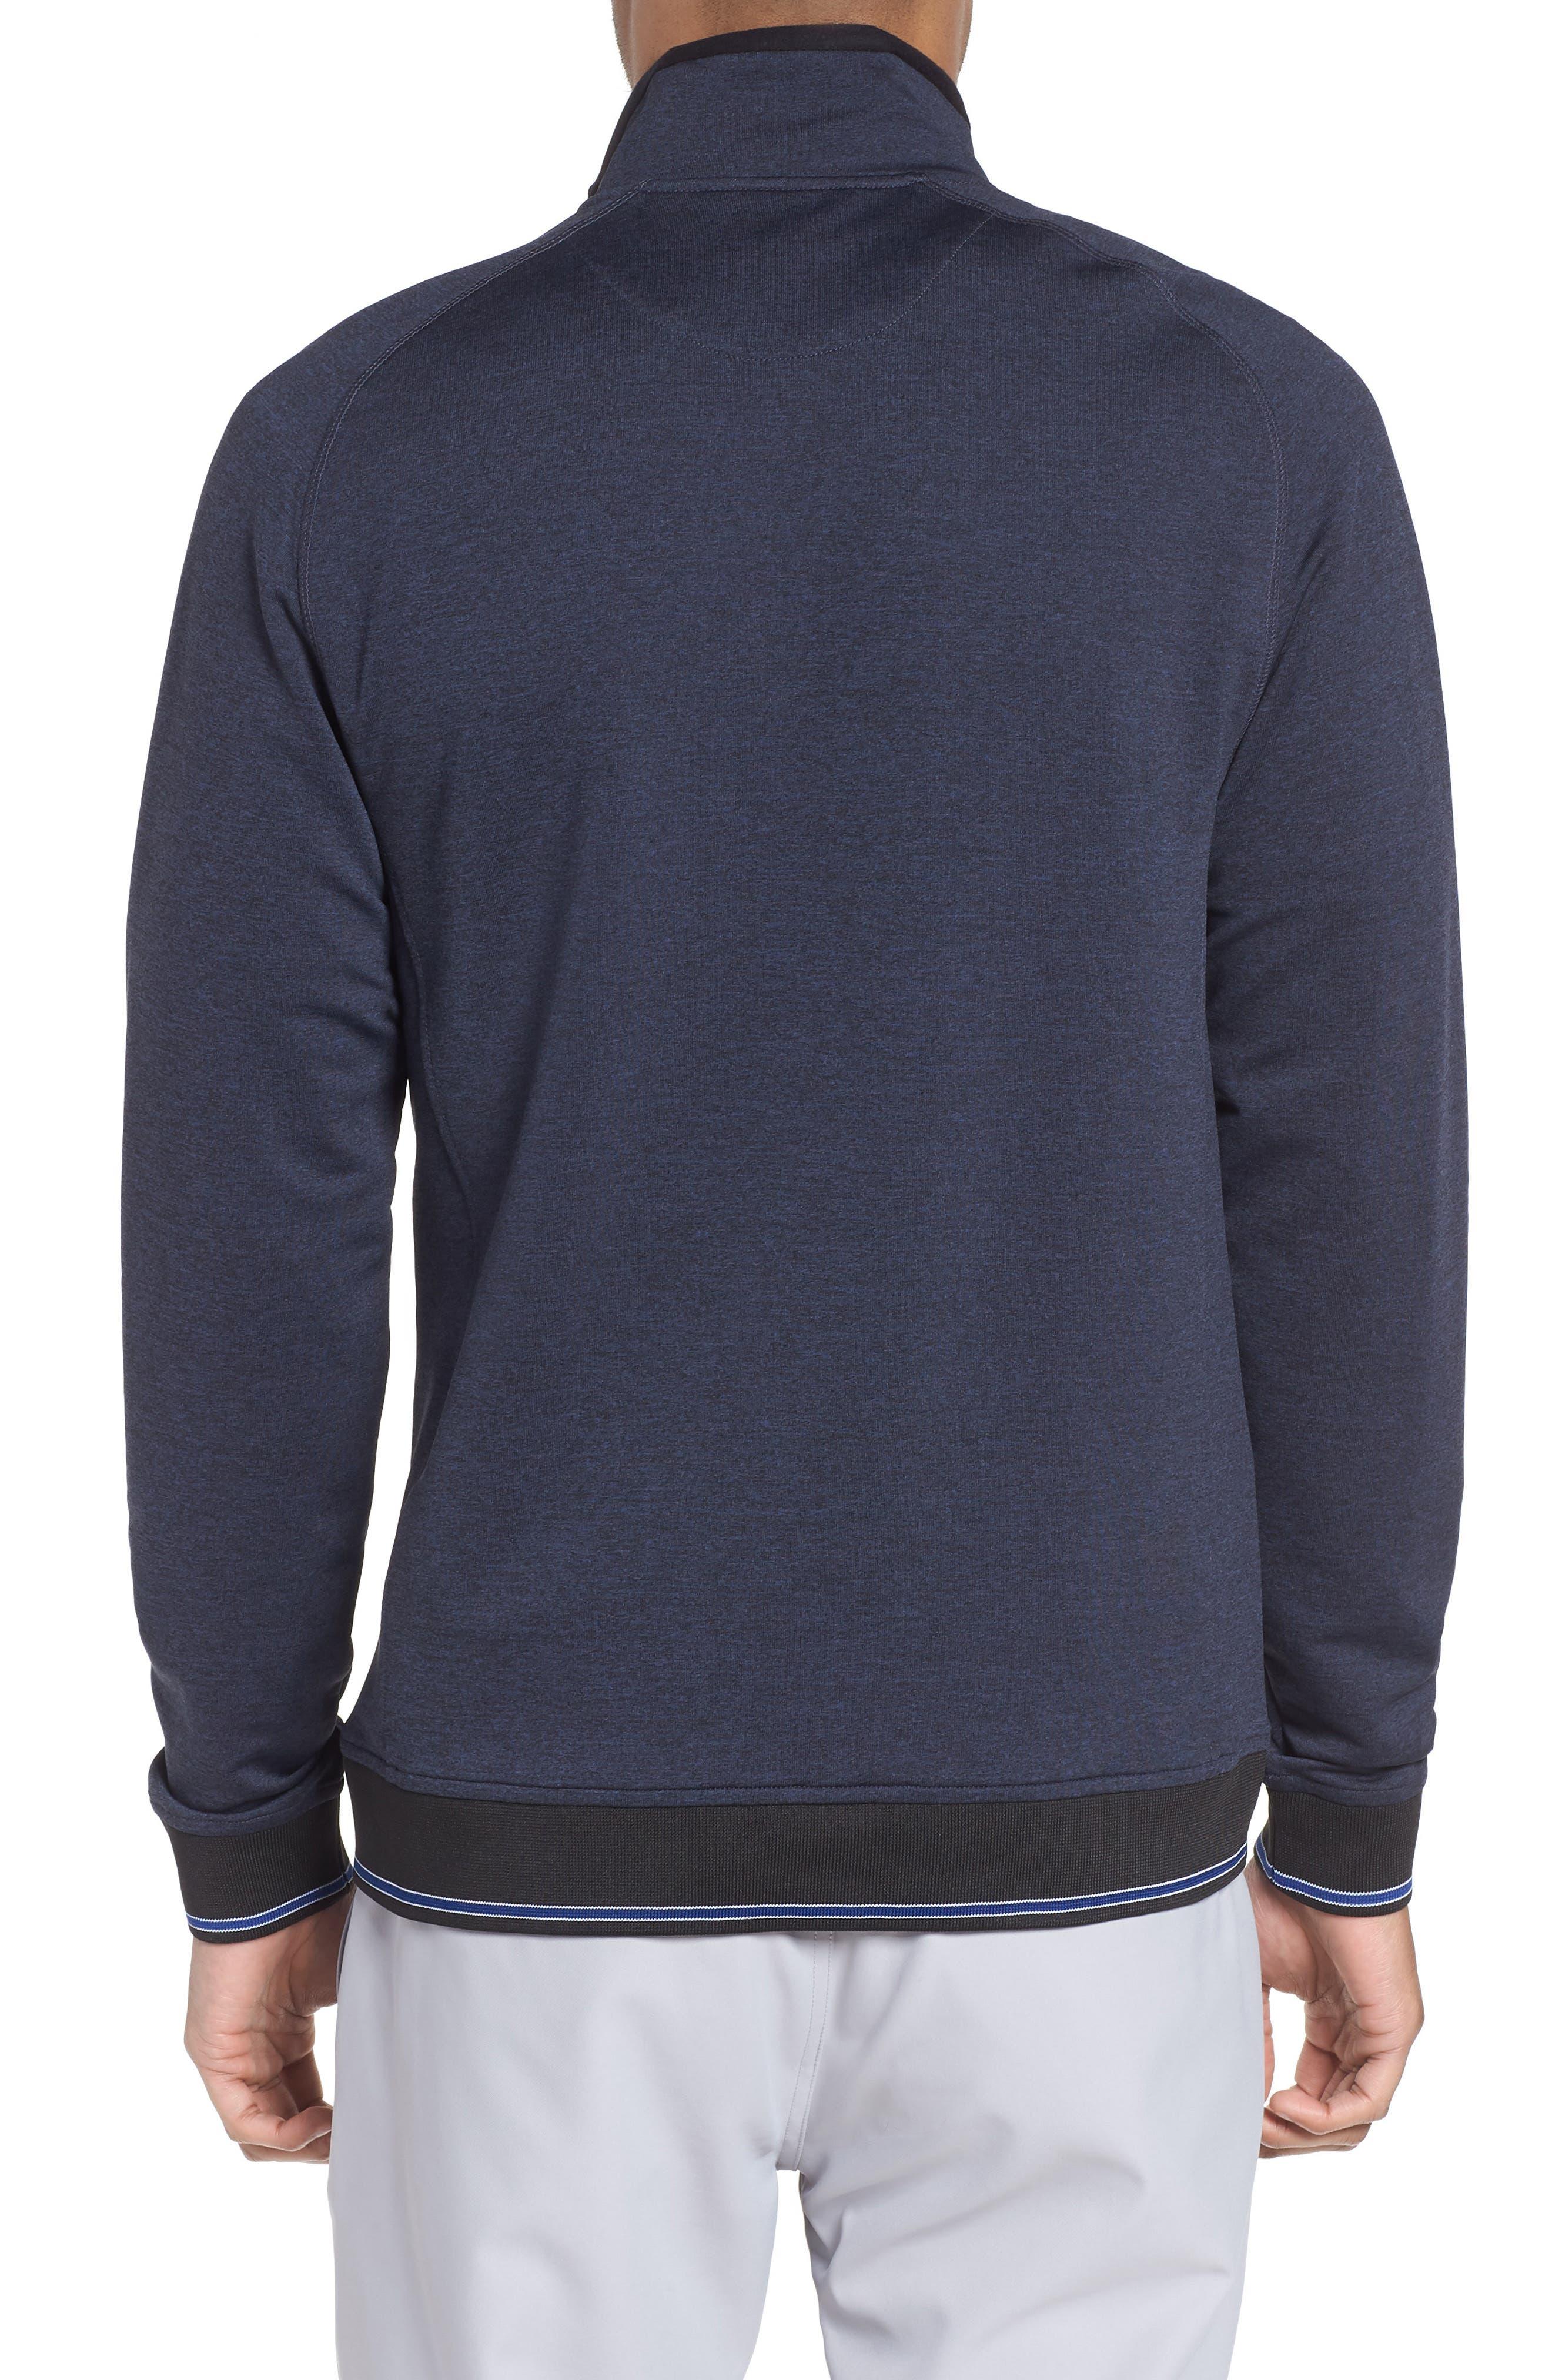 Parway Knit Golf Jacket,                             Alternate thumbnail 2, color,                             410